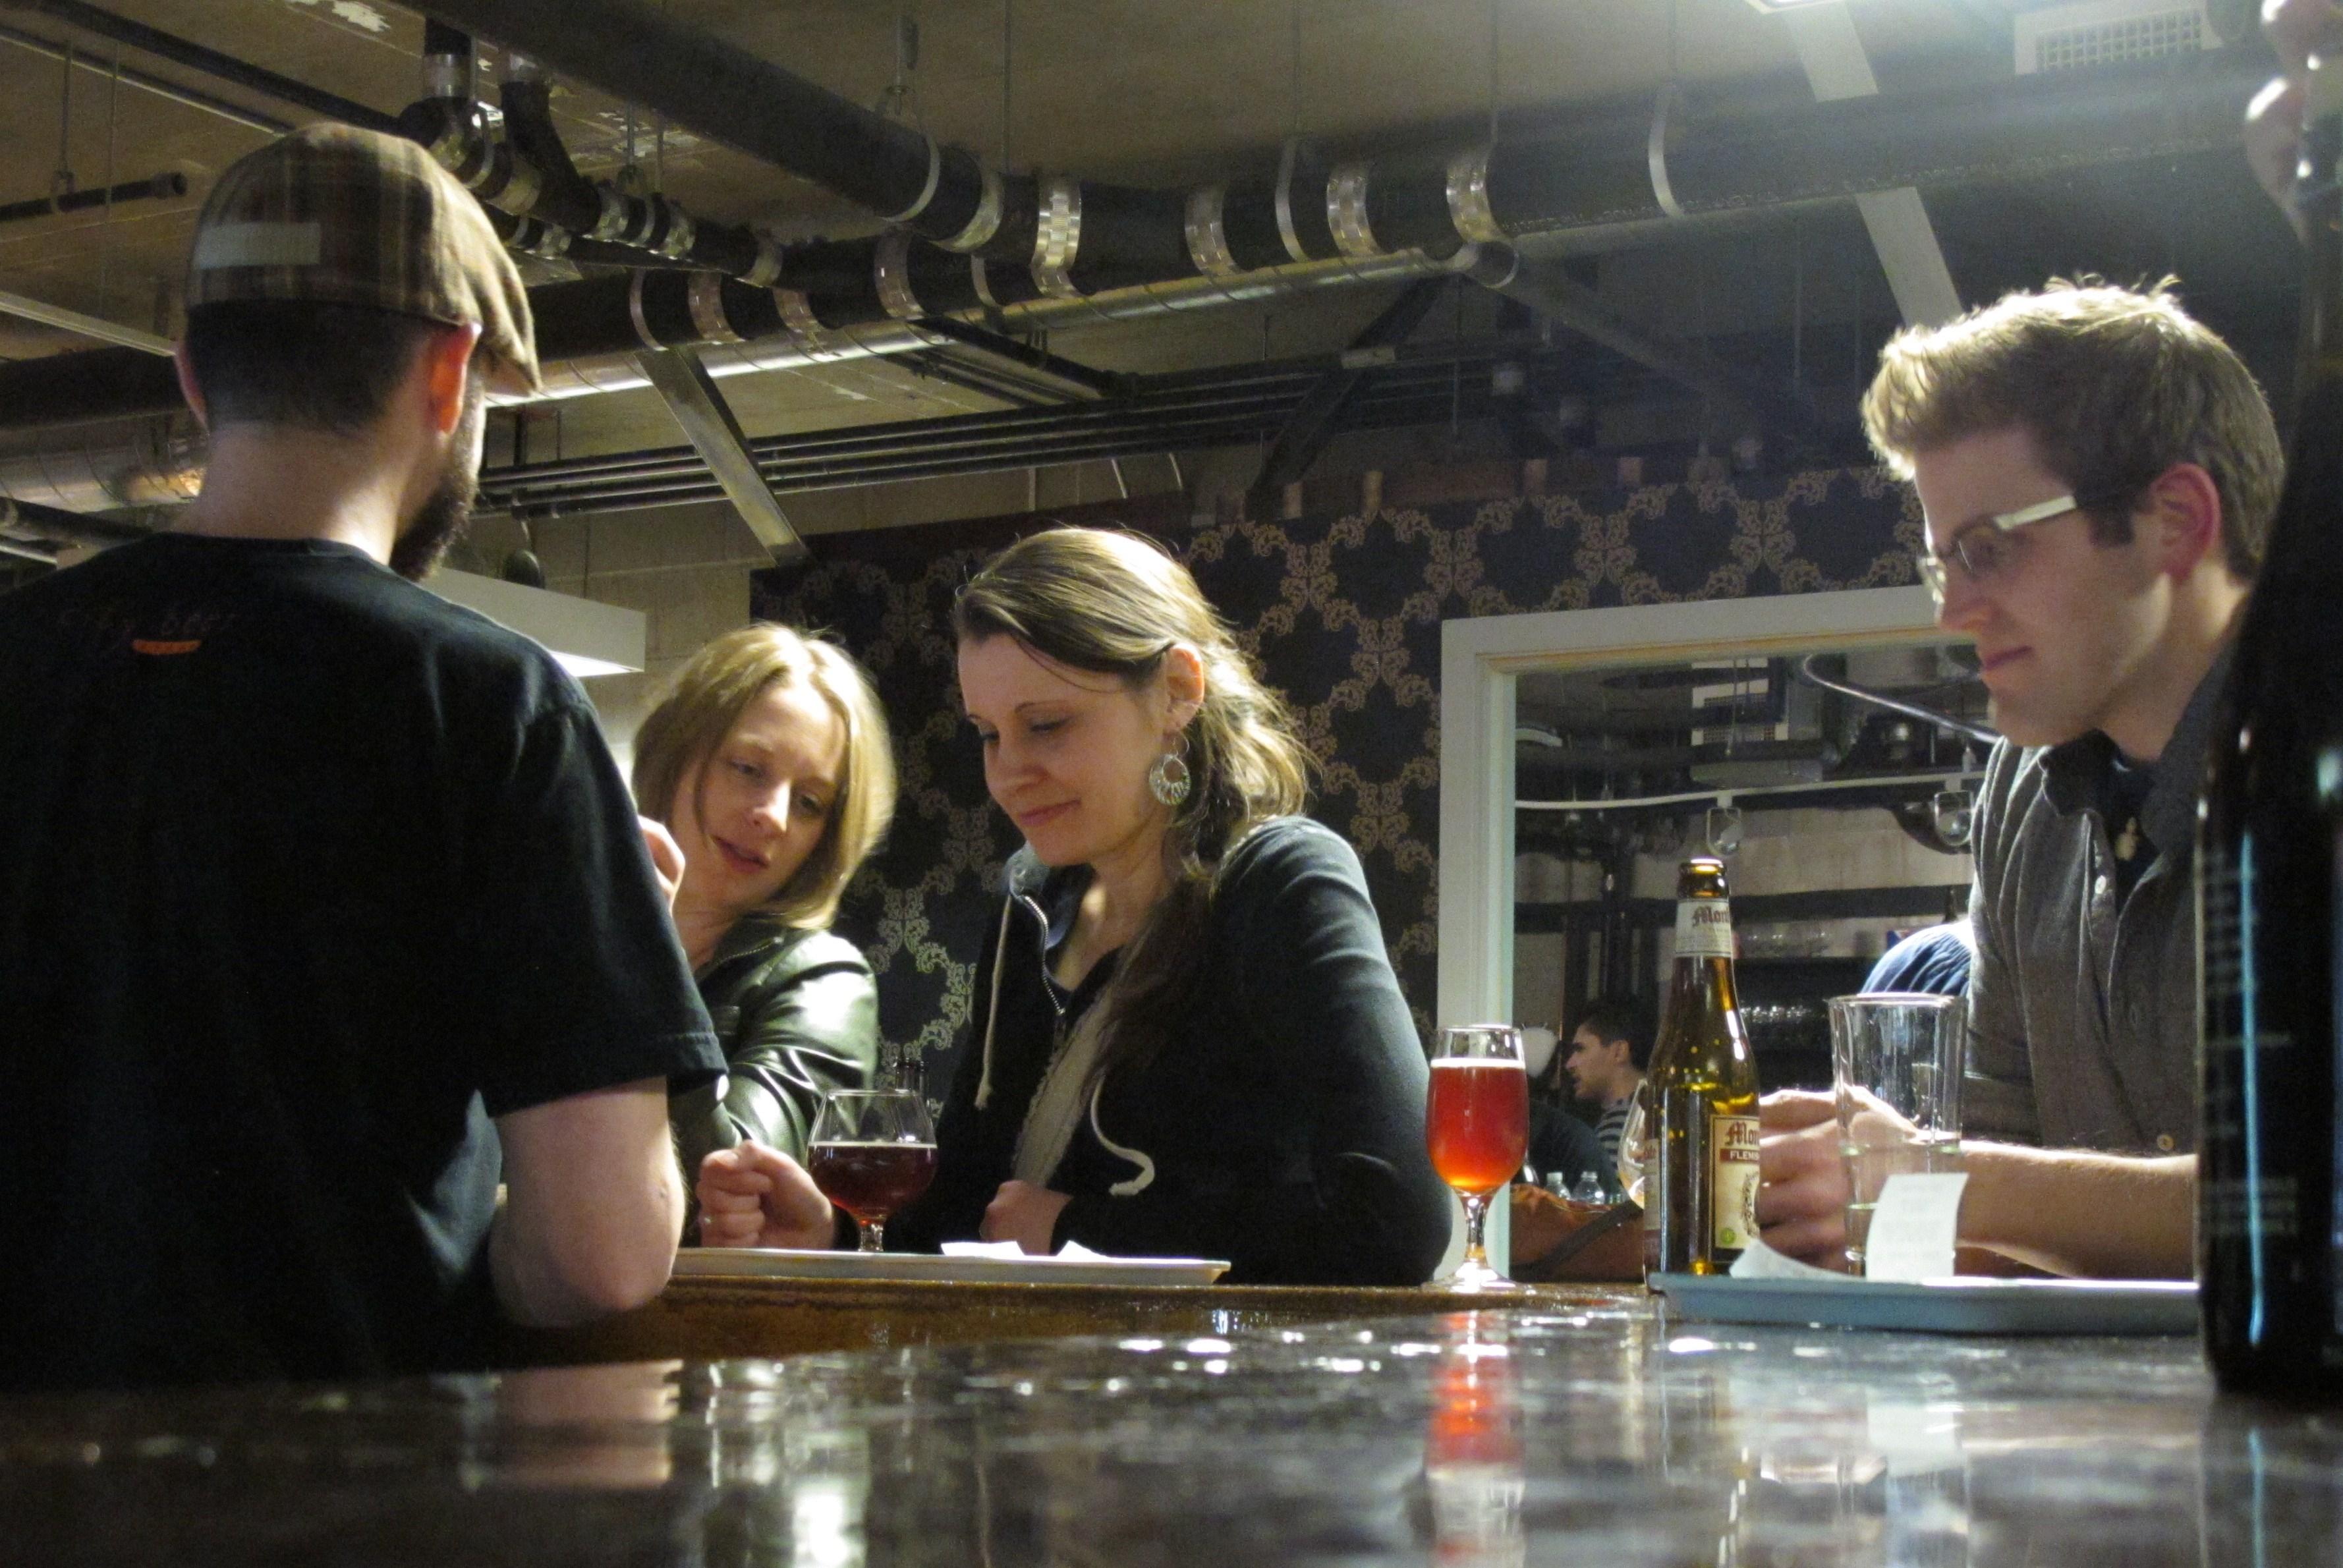 At the bar at City Beer Store in 2011